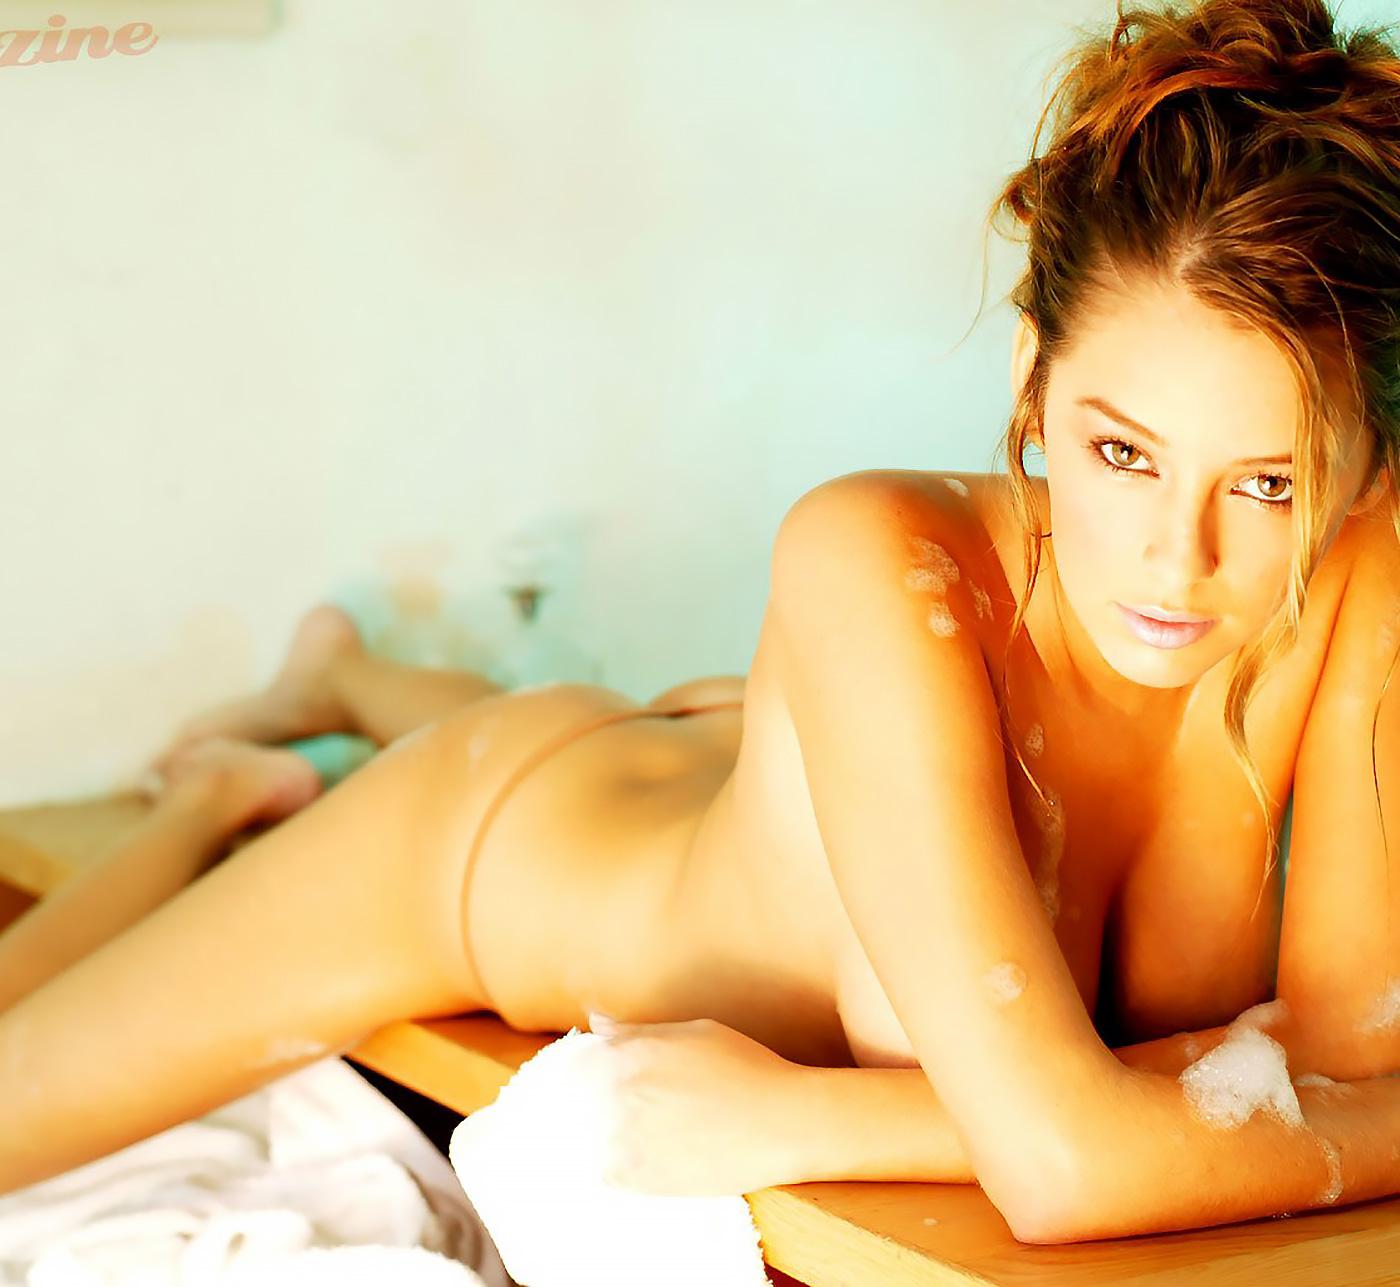 Nude photos of ex girlfriends hairy vagina